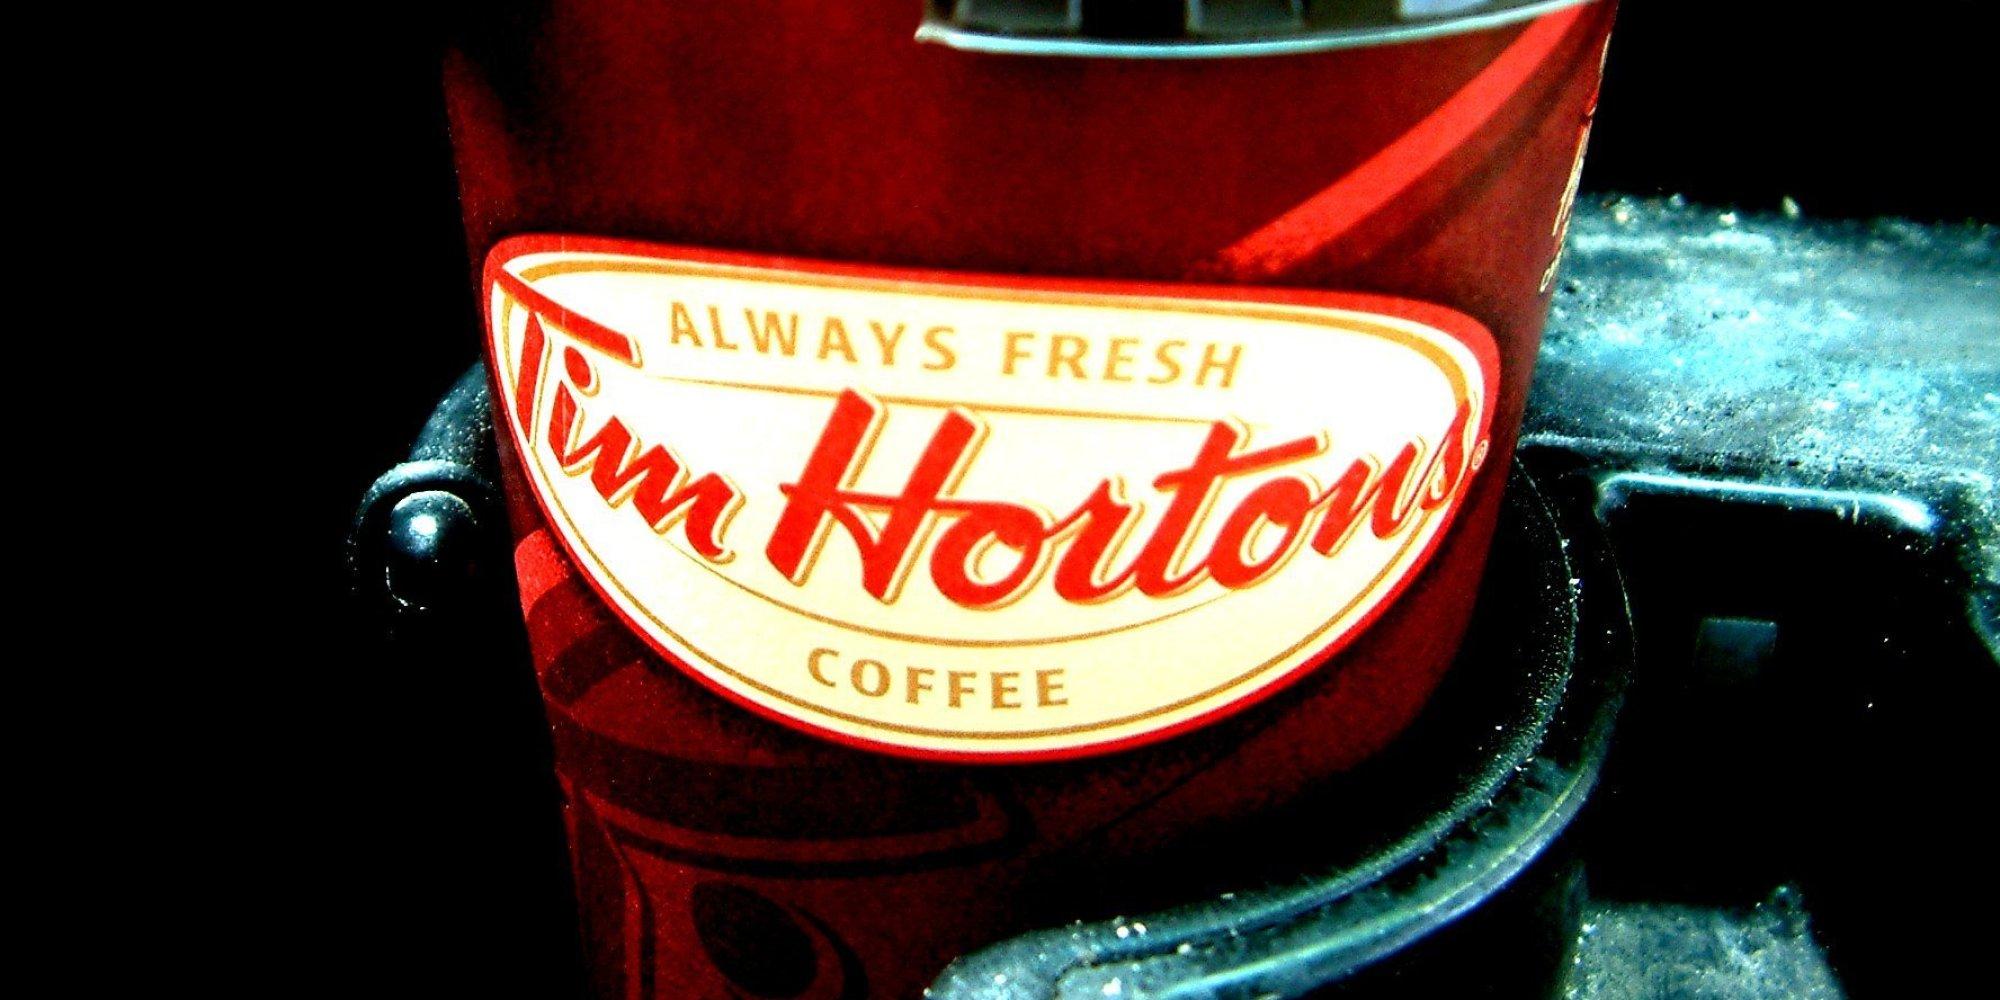 20 tim hortons secret menu items approved by readers